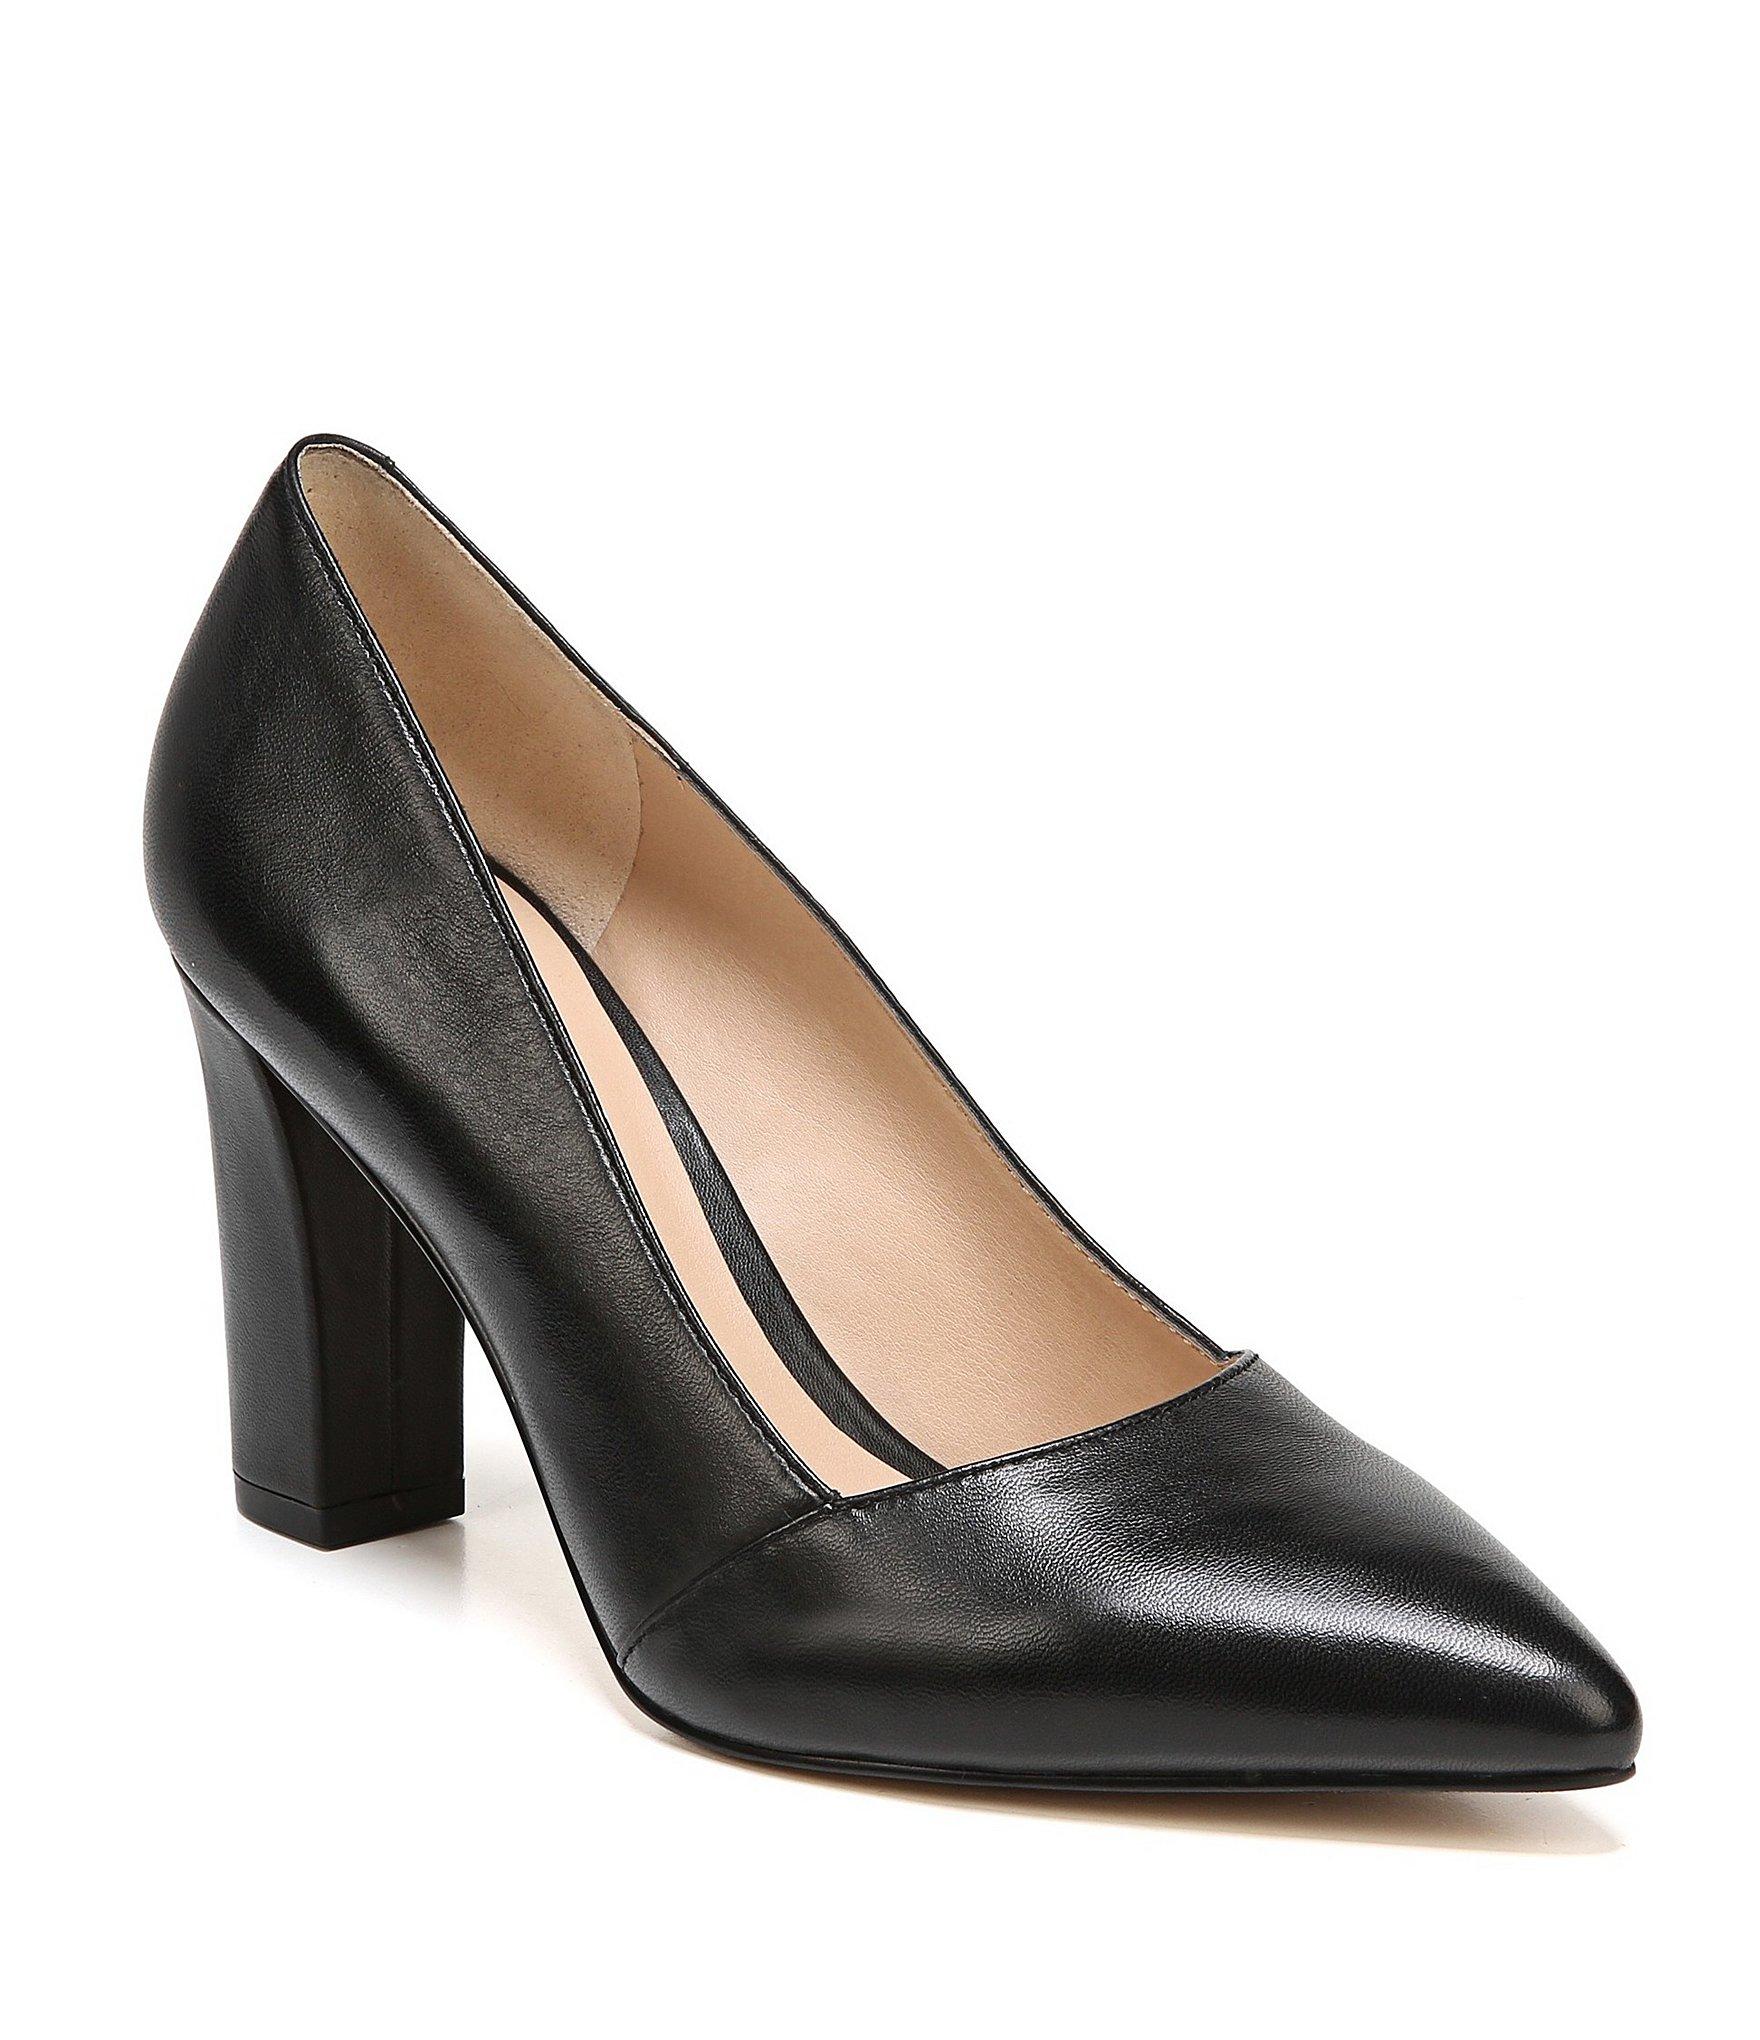 black high heel shoes womenu0027s high heel pointed toe pumps | dillards MTLZVDR